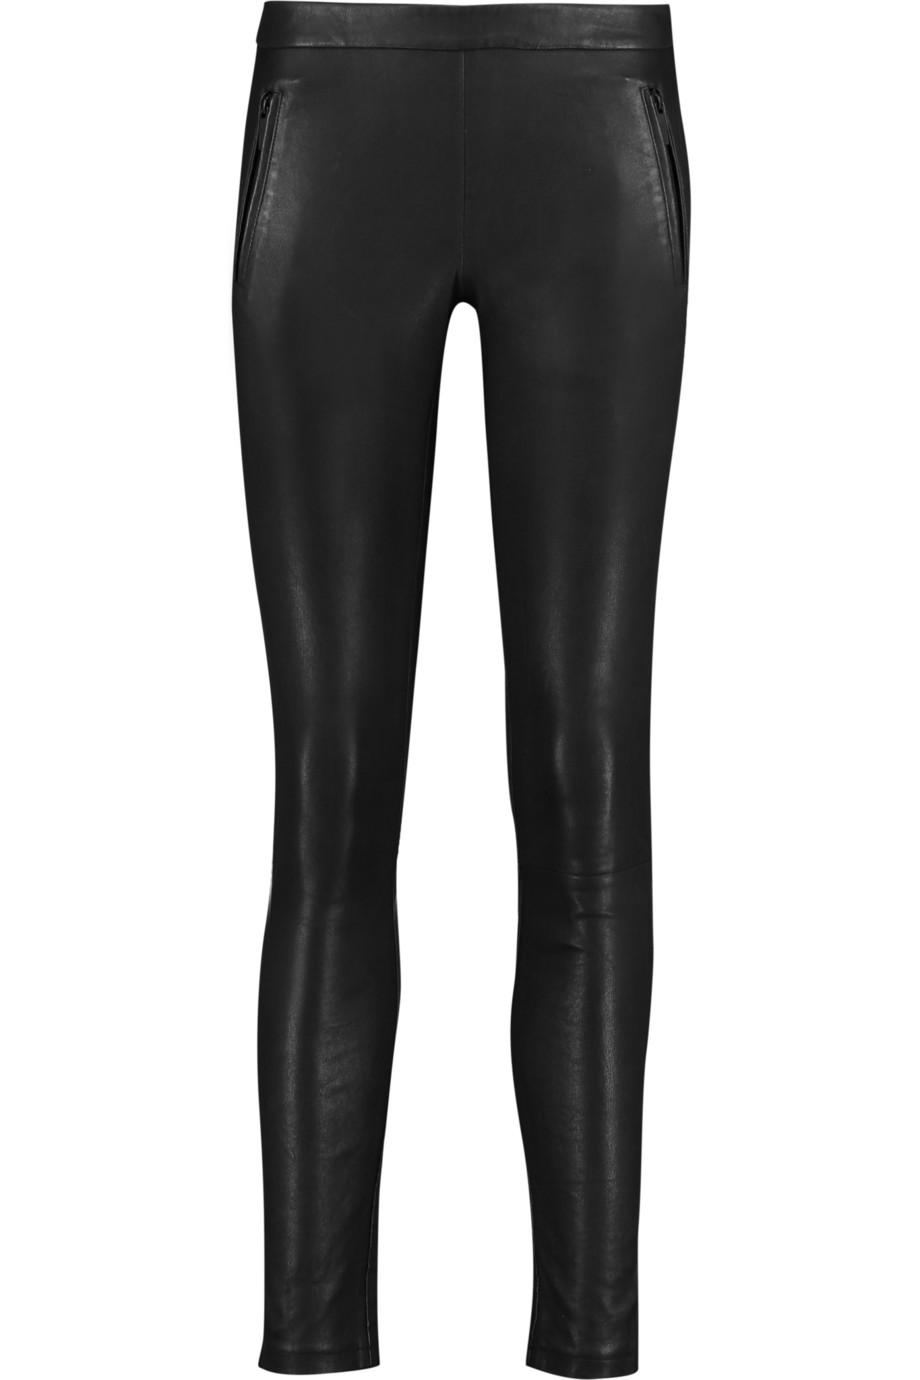 Karl Lagerfeld Leather Skinnys $330